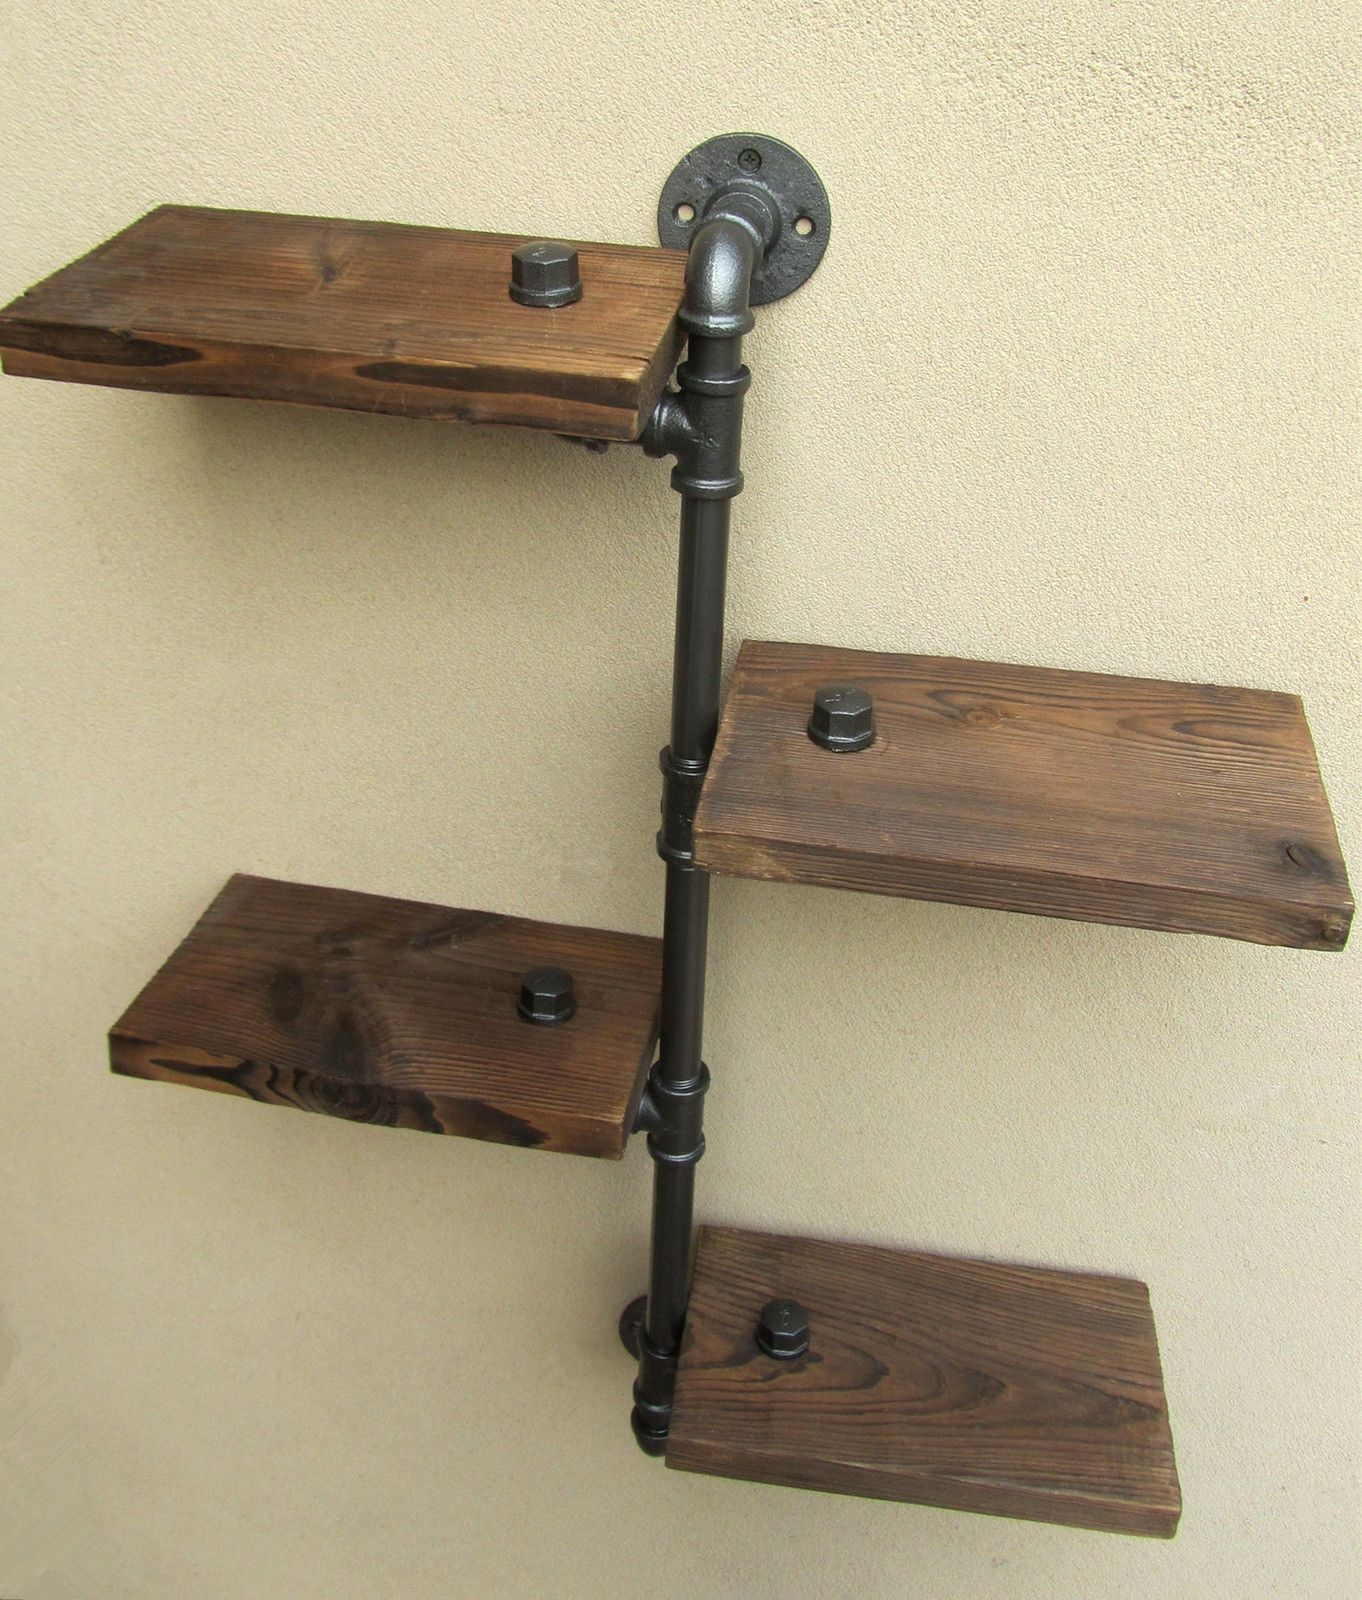 Urban industrial rustic wall mount iron pipe tiers wood shelf